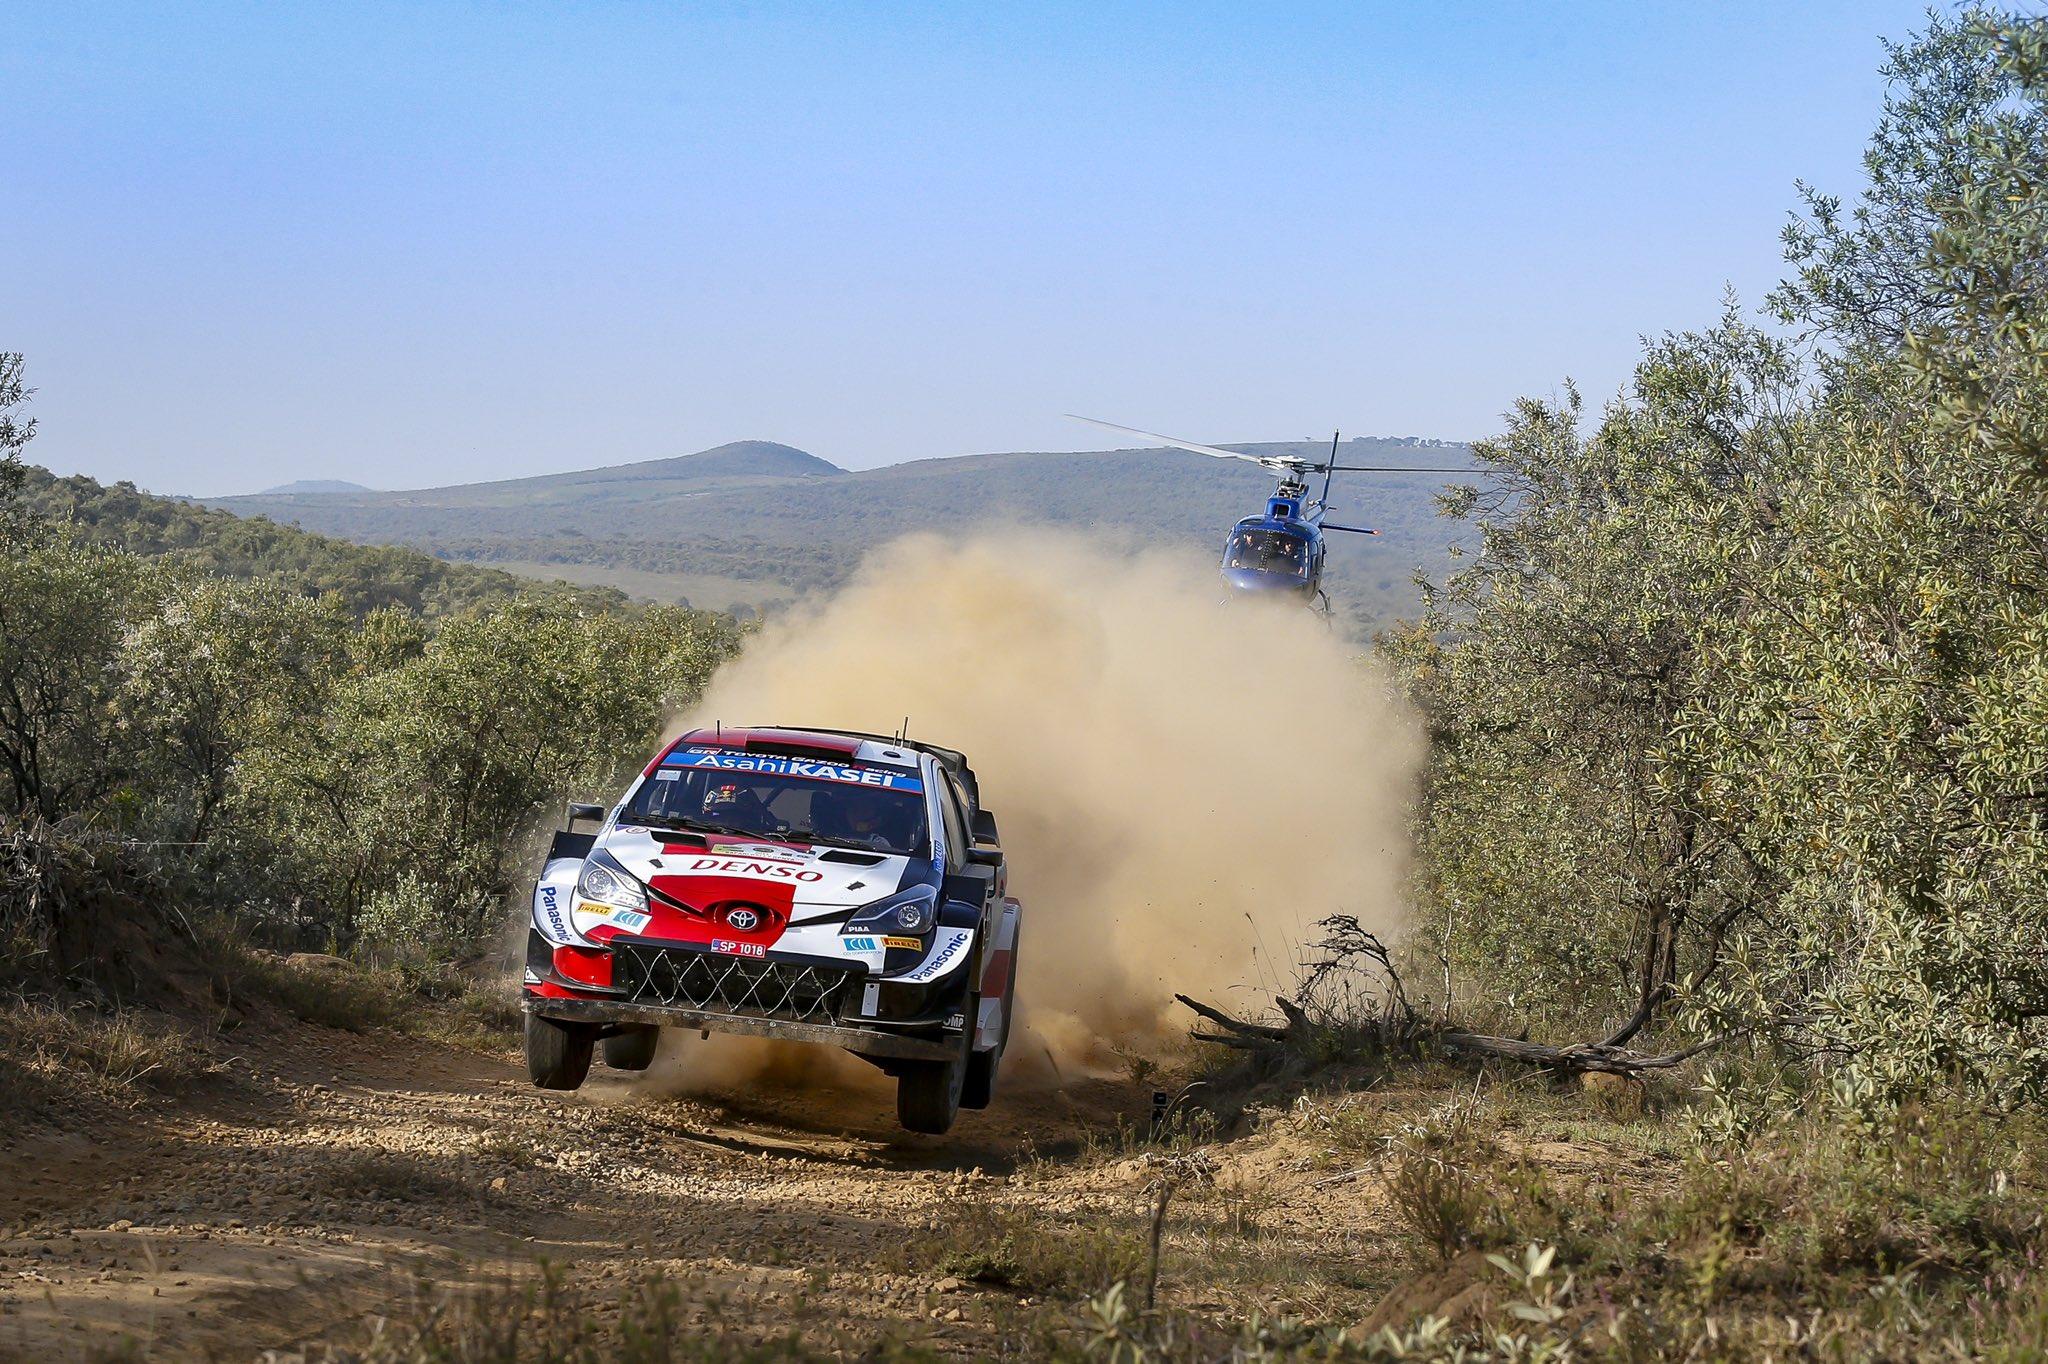 WRC: Safari Rally Kenya [23-27 Junio] - Página 4 E4y3zkyXwAE1OEB?format=jpg&name=large